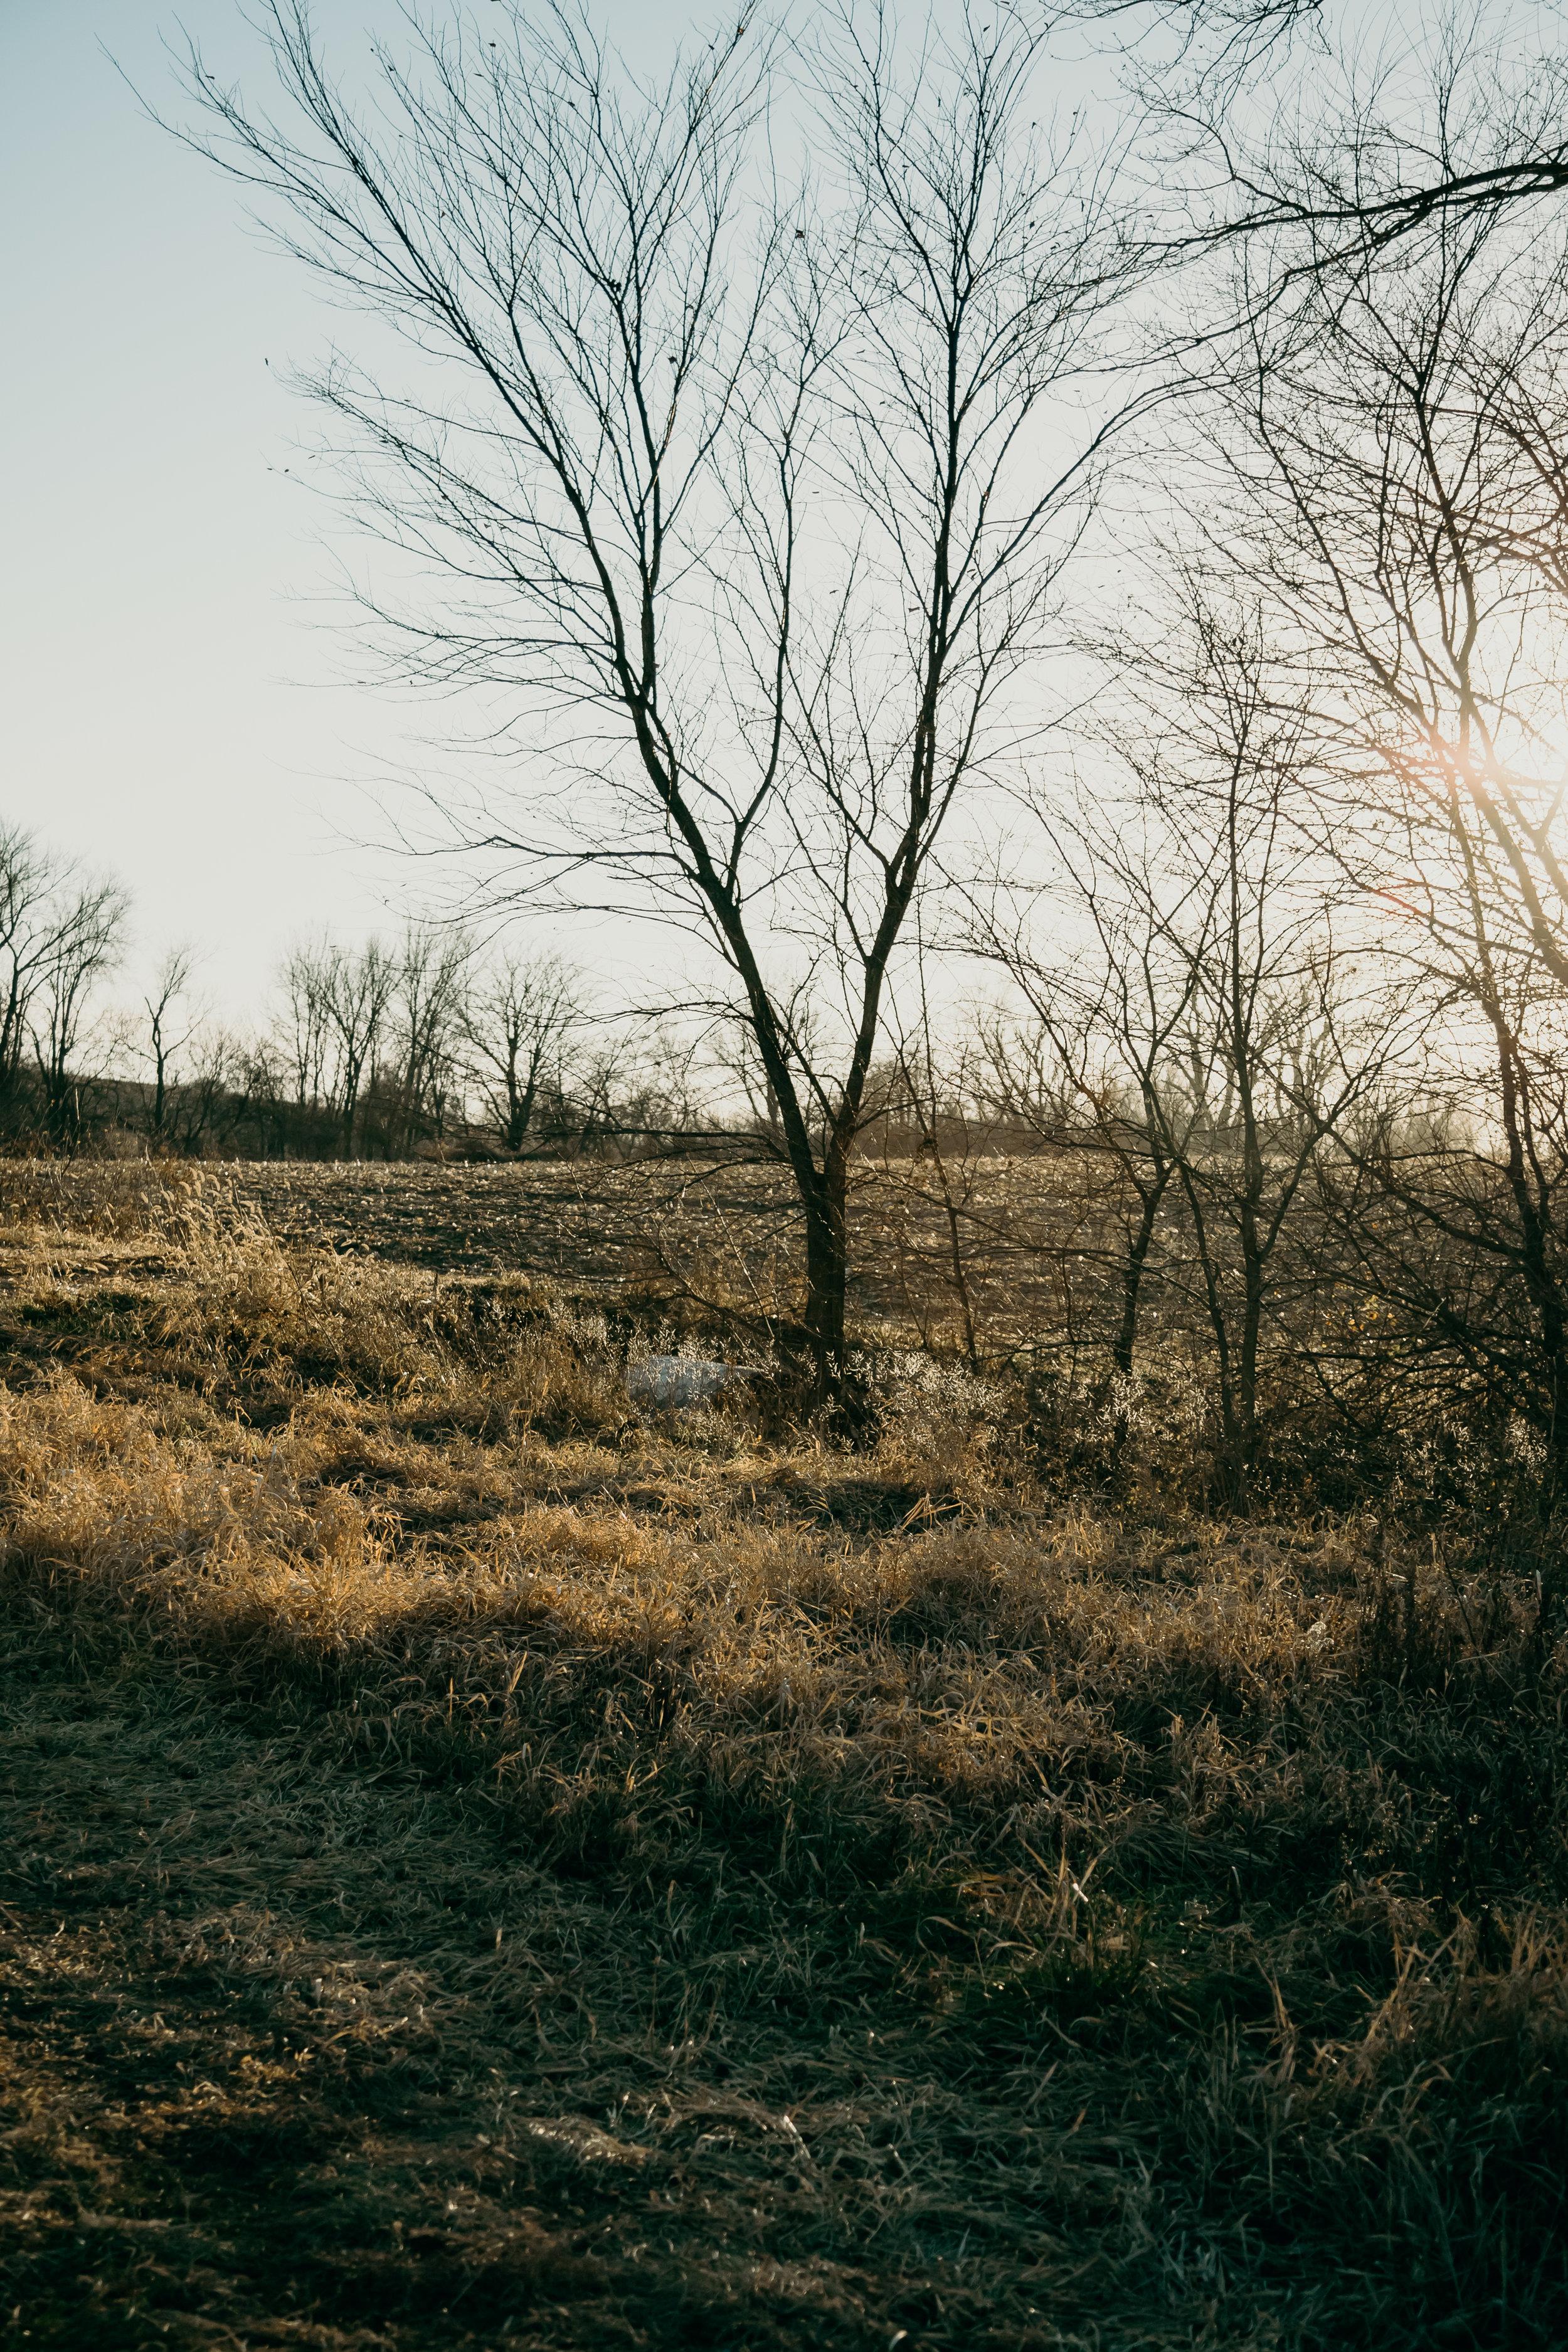 Farm_fun_phil_chester_presets_chicago_photographer-9.jpg